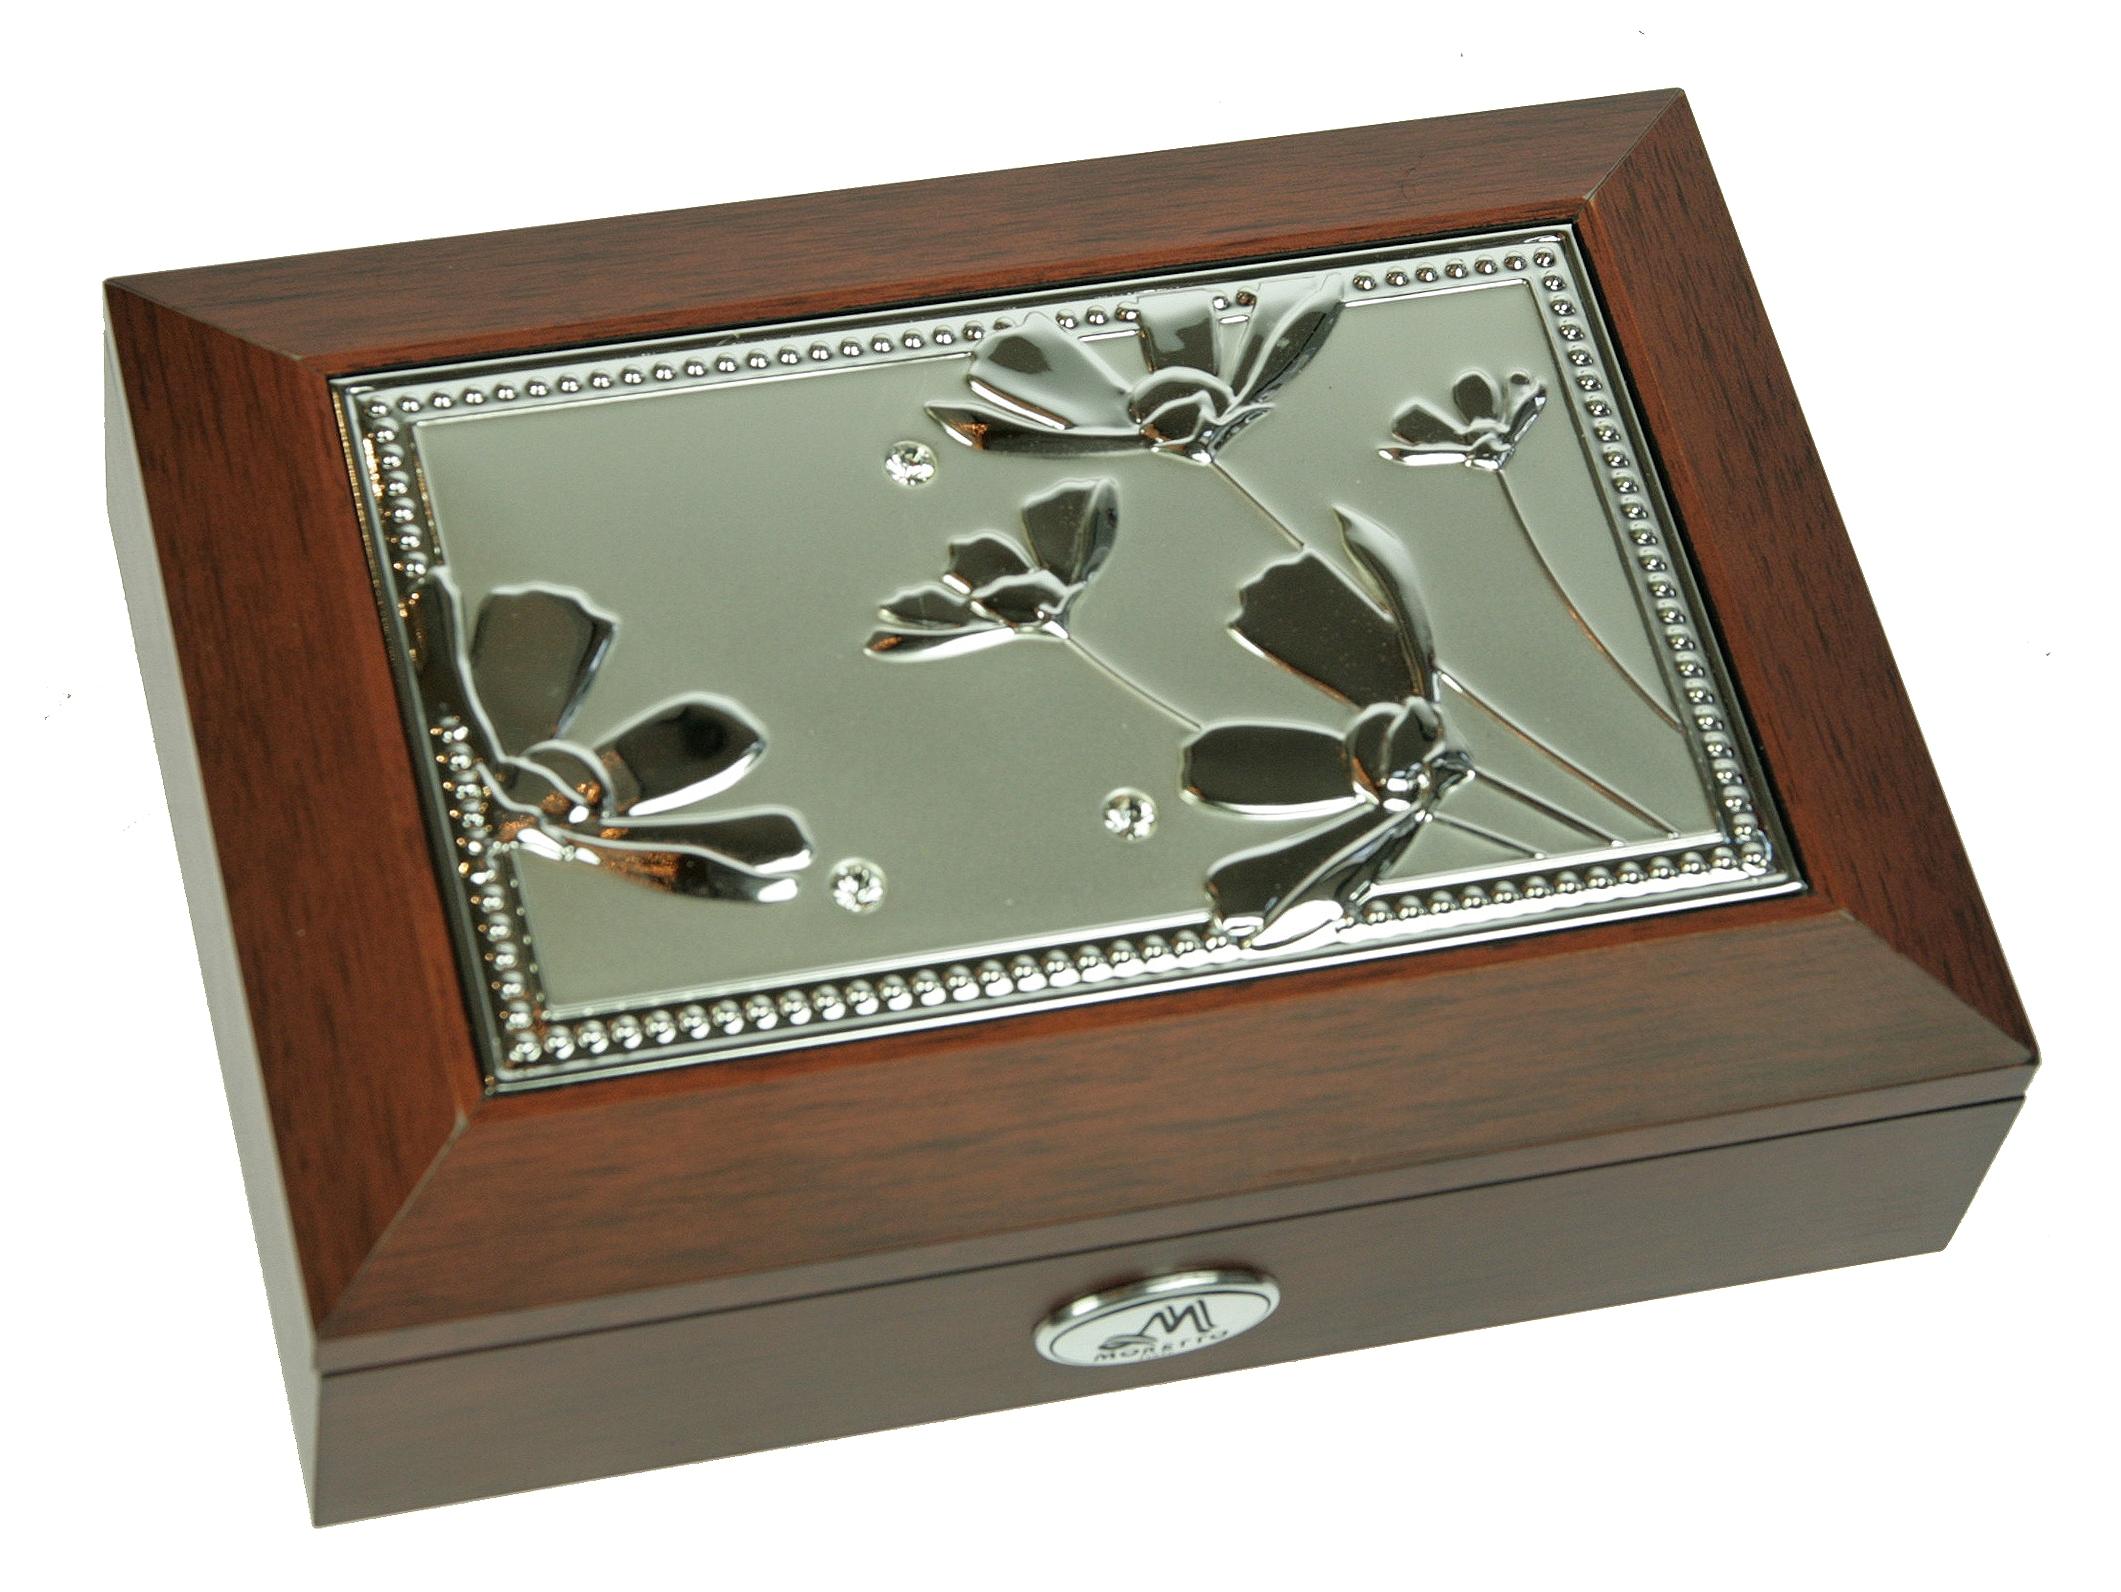 Шкатулка для ювелирных украшений Moretto, 18 х 13 х 5 см. 39850 шкатулка для ювелирных украшений moretto 18 х 13 х 5 см 139522